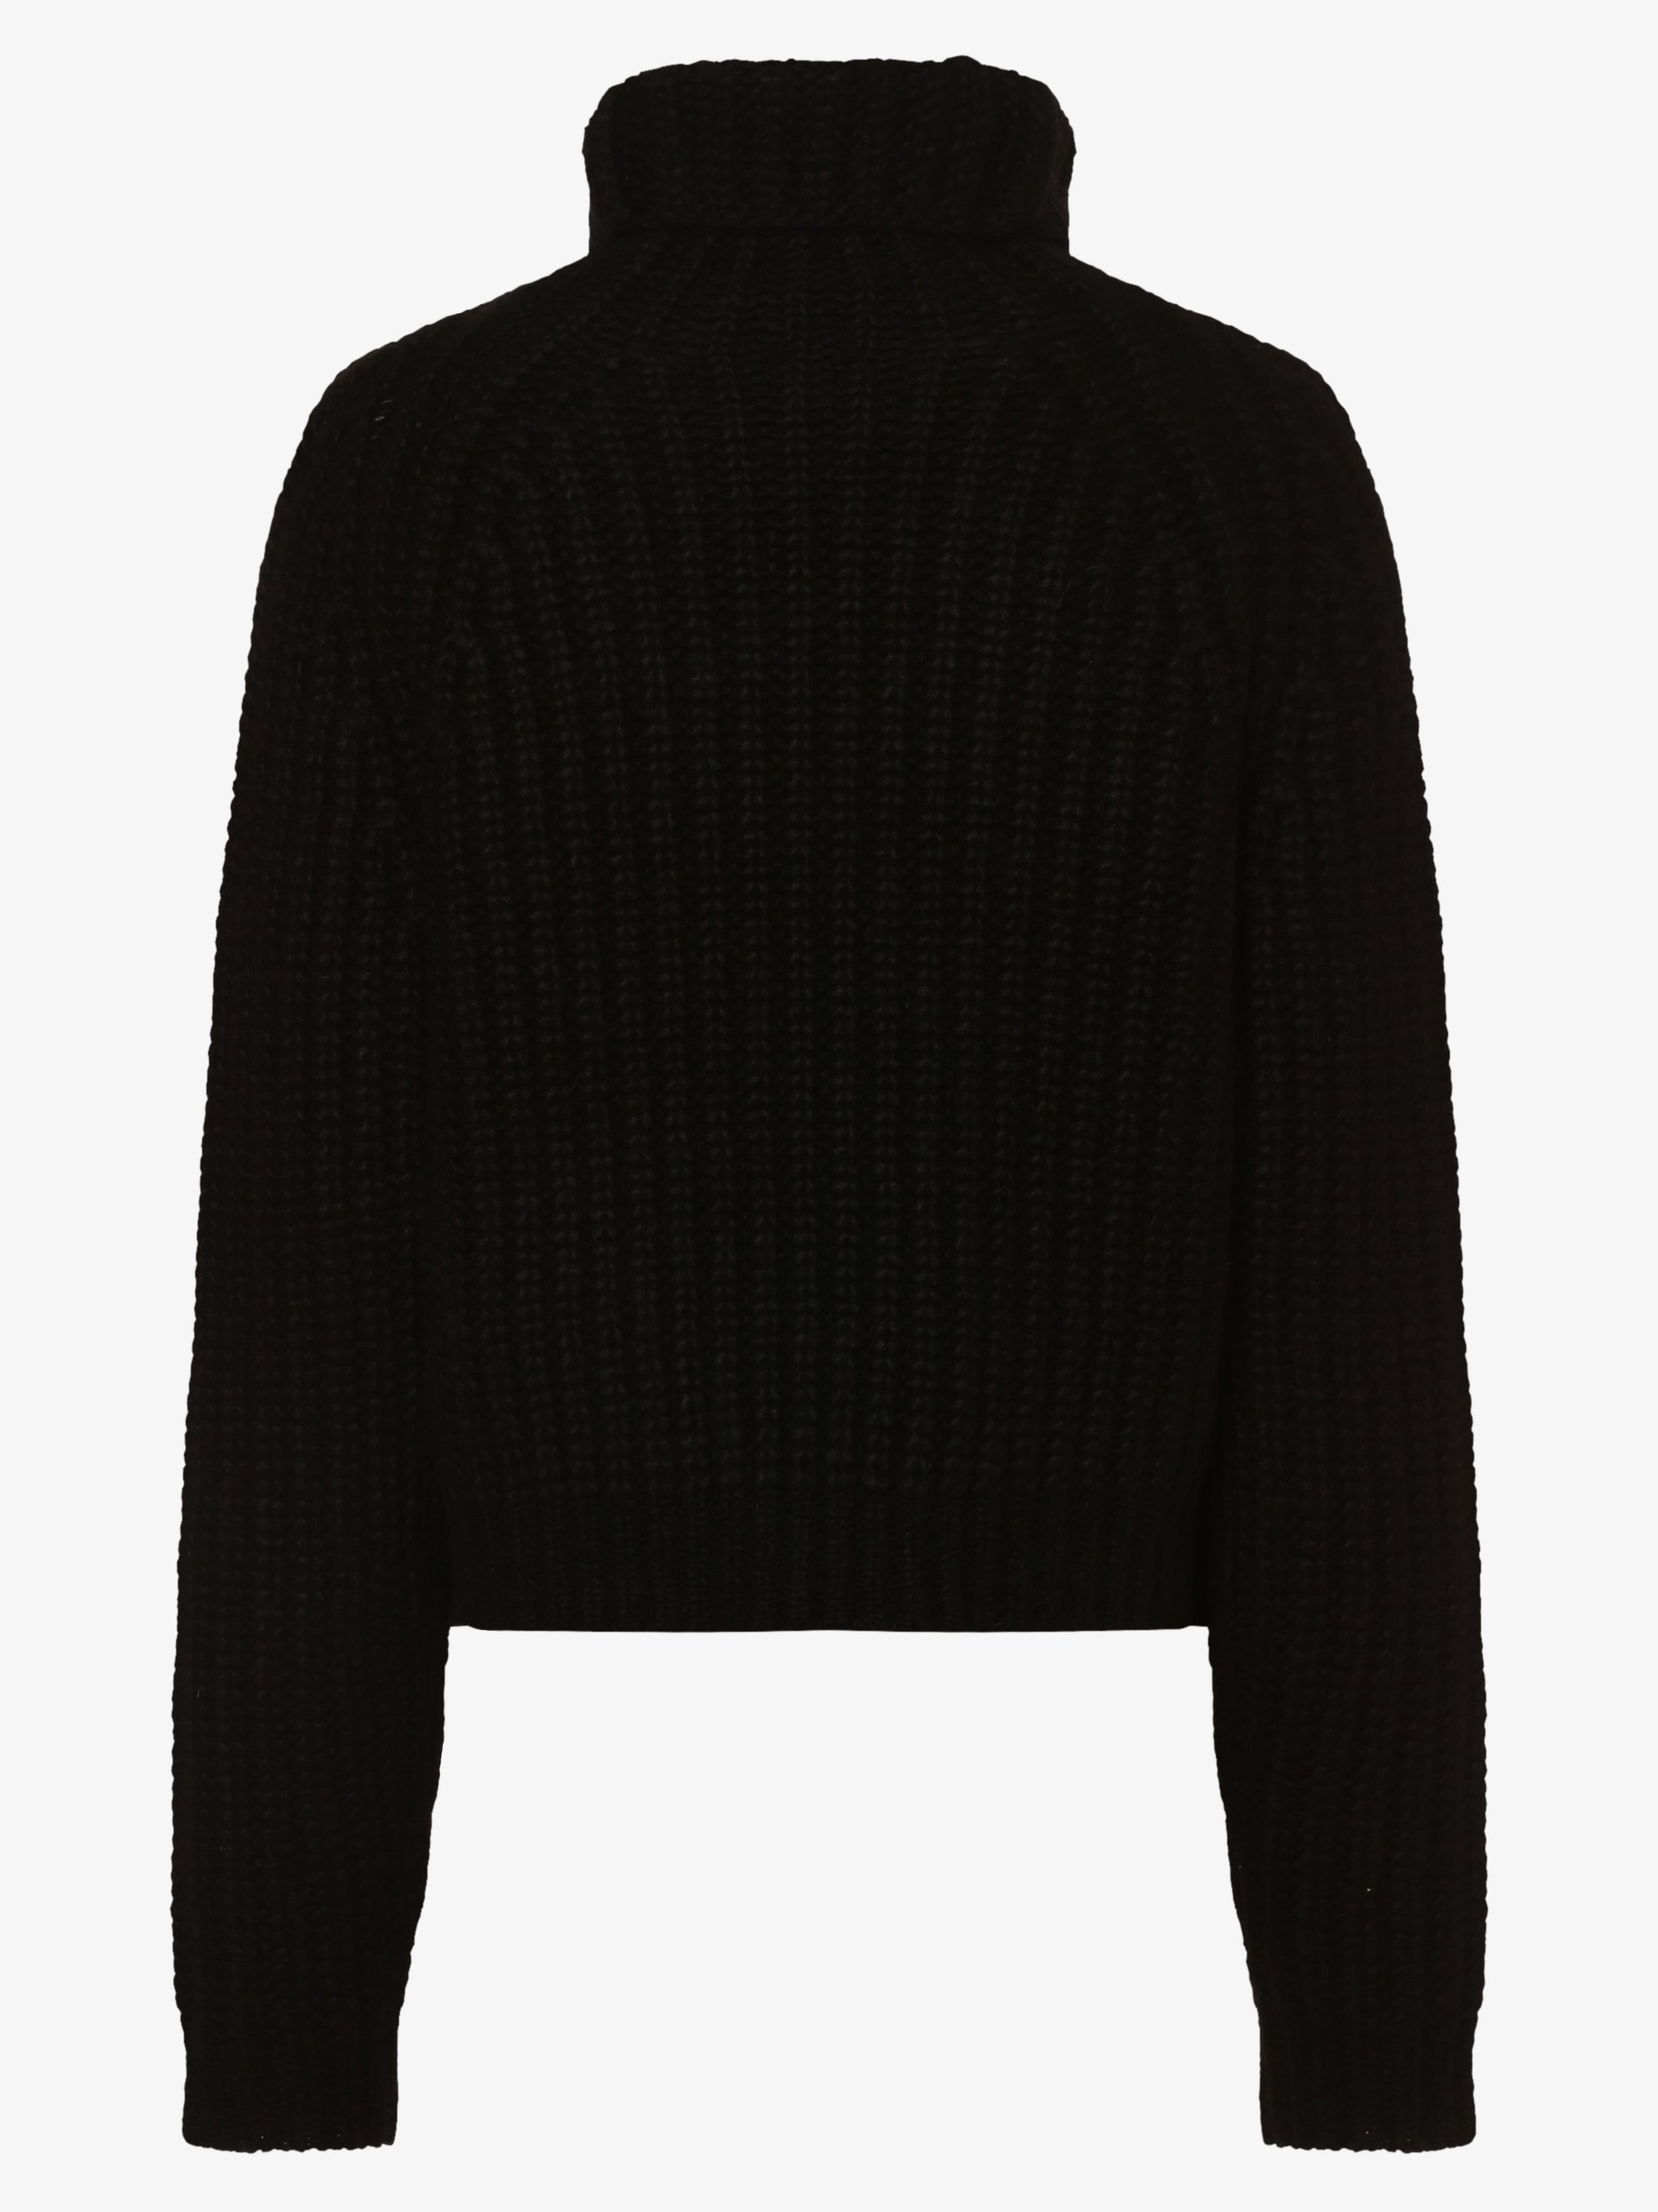 BOSS Casual Damen Pullover mit Alpaka-Anteil - Warantel